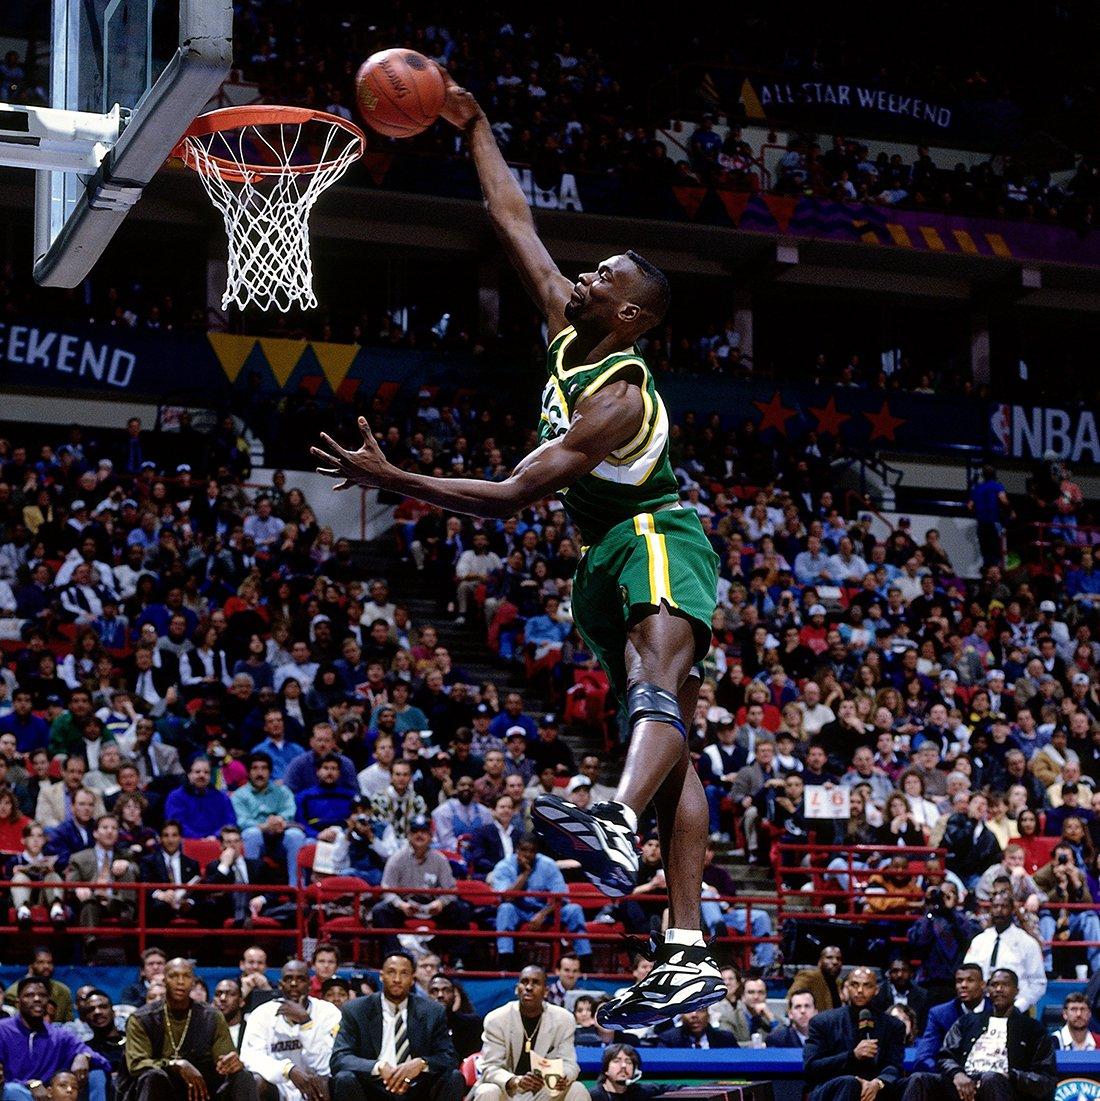 Shawn Kemp 1994 Slam Dunk Contest en viva basquet